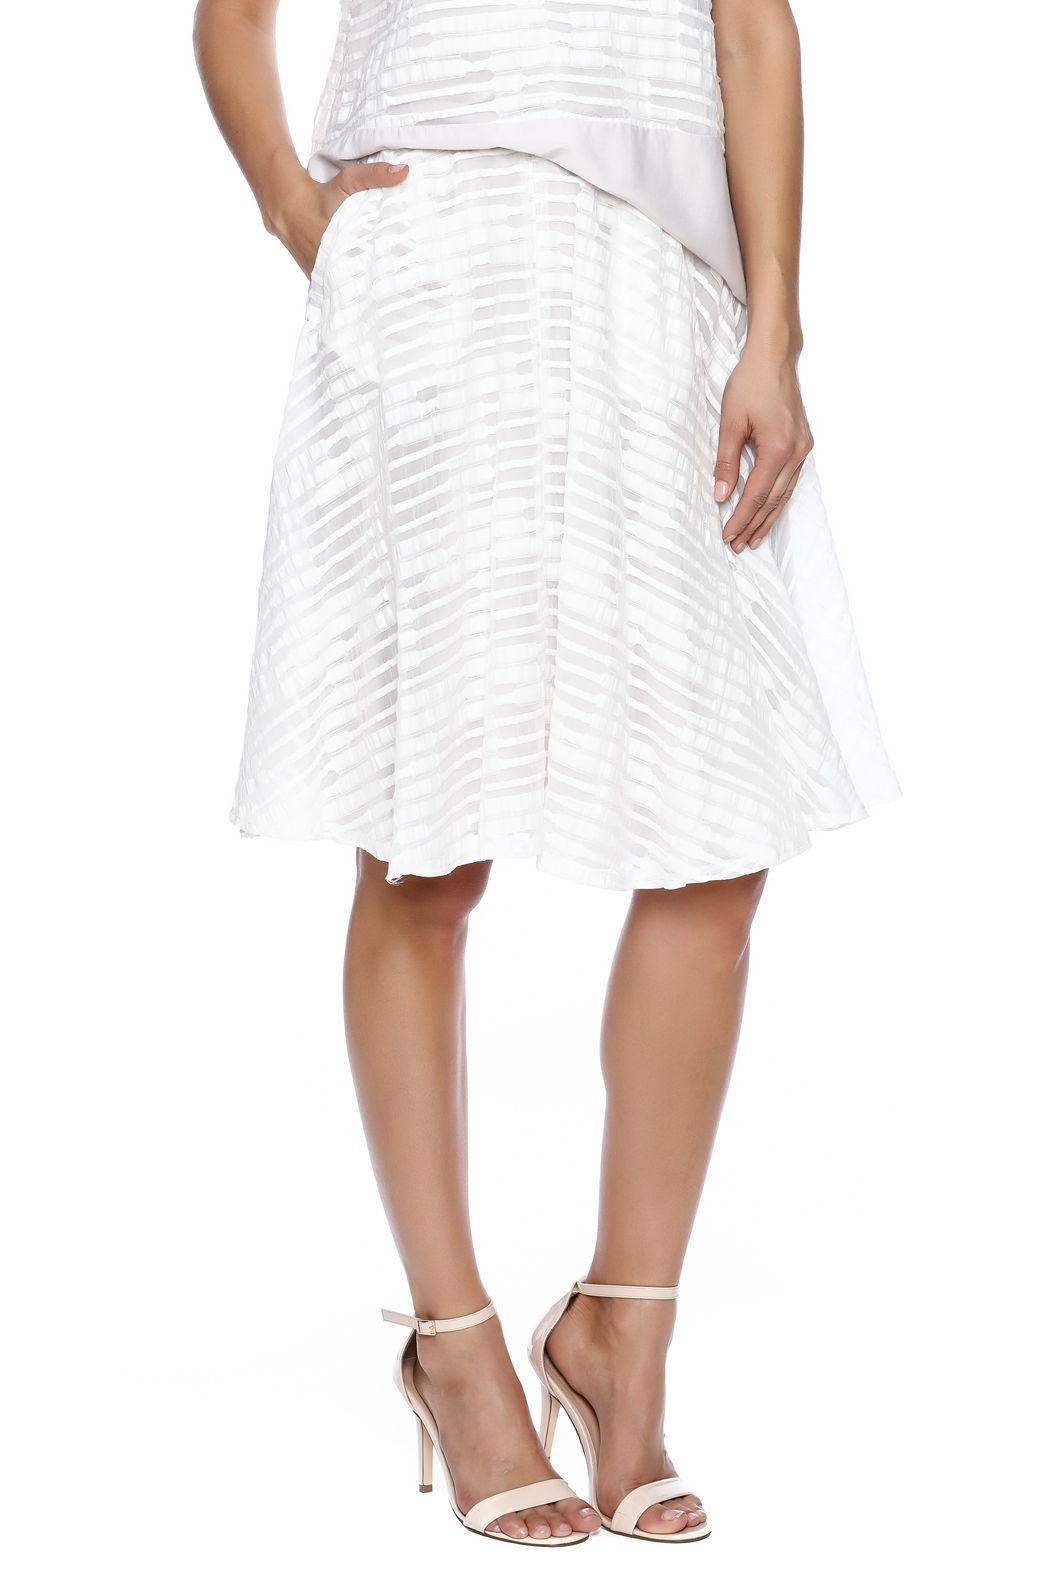 Waverly Grey Flared Skirt | More Flared skirt and Elastic waist ideas